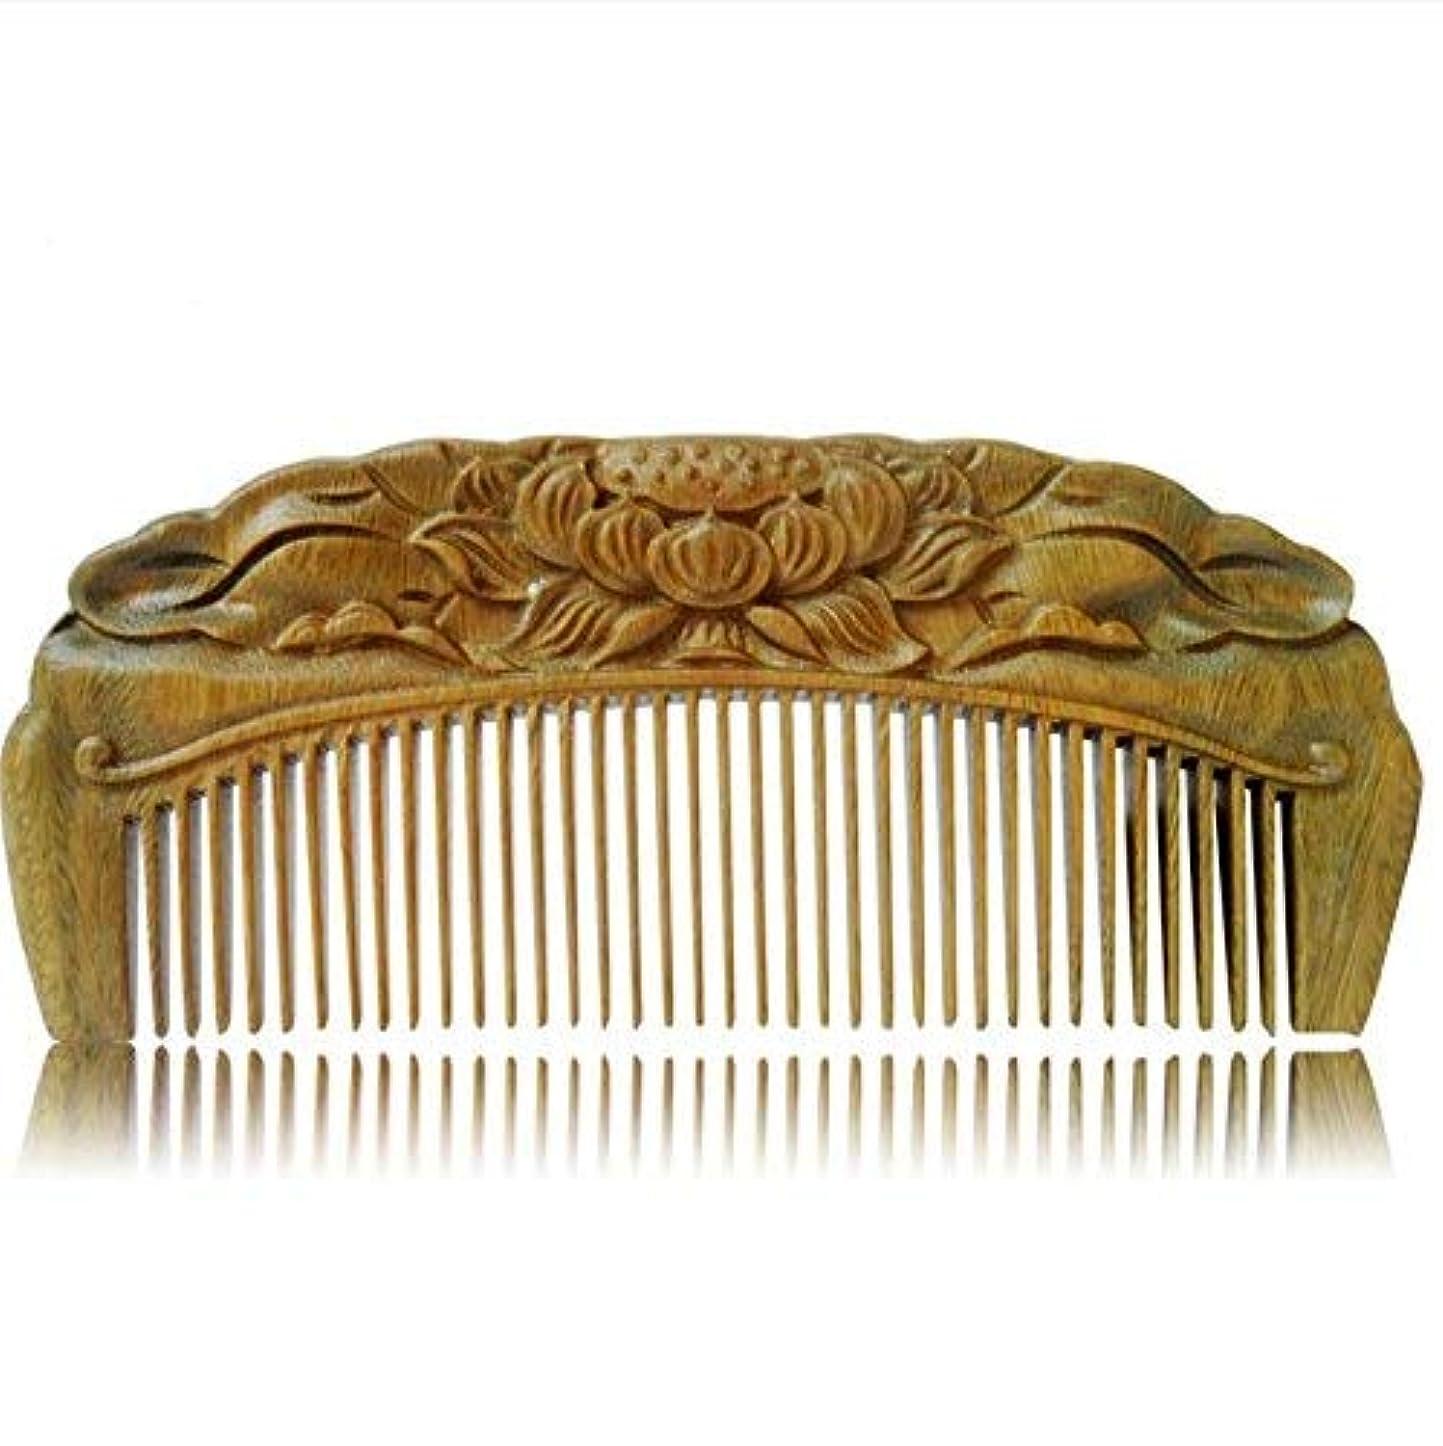 Handmade Carved Natural Sandalwood Hair Comb - Anti-static Sandalwood Hair Comb Beard Brush Rake Comb Handmade...